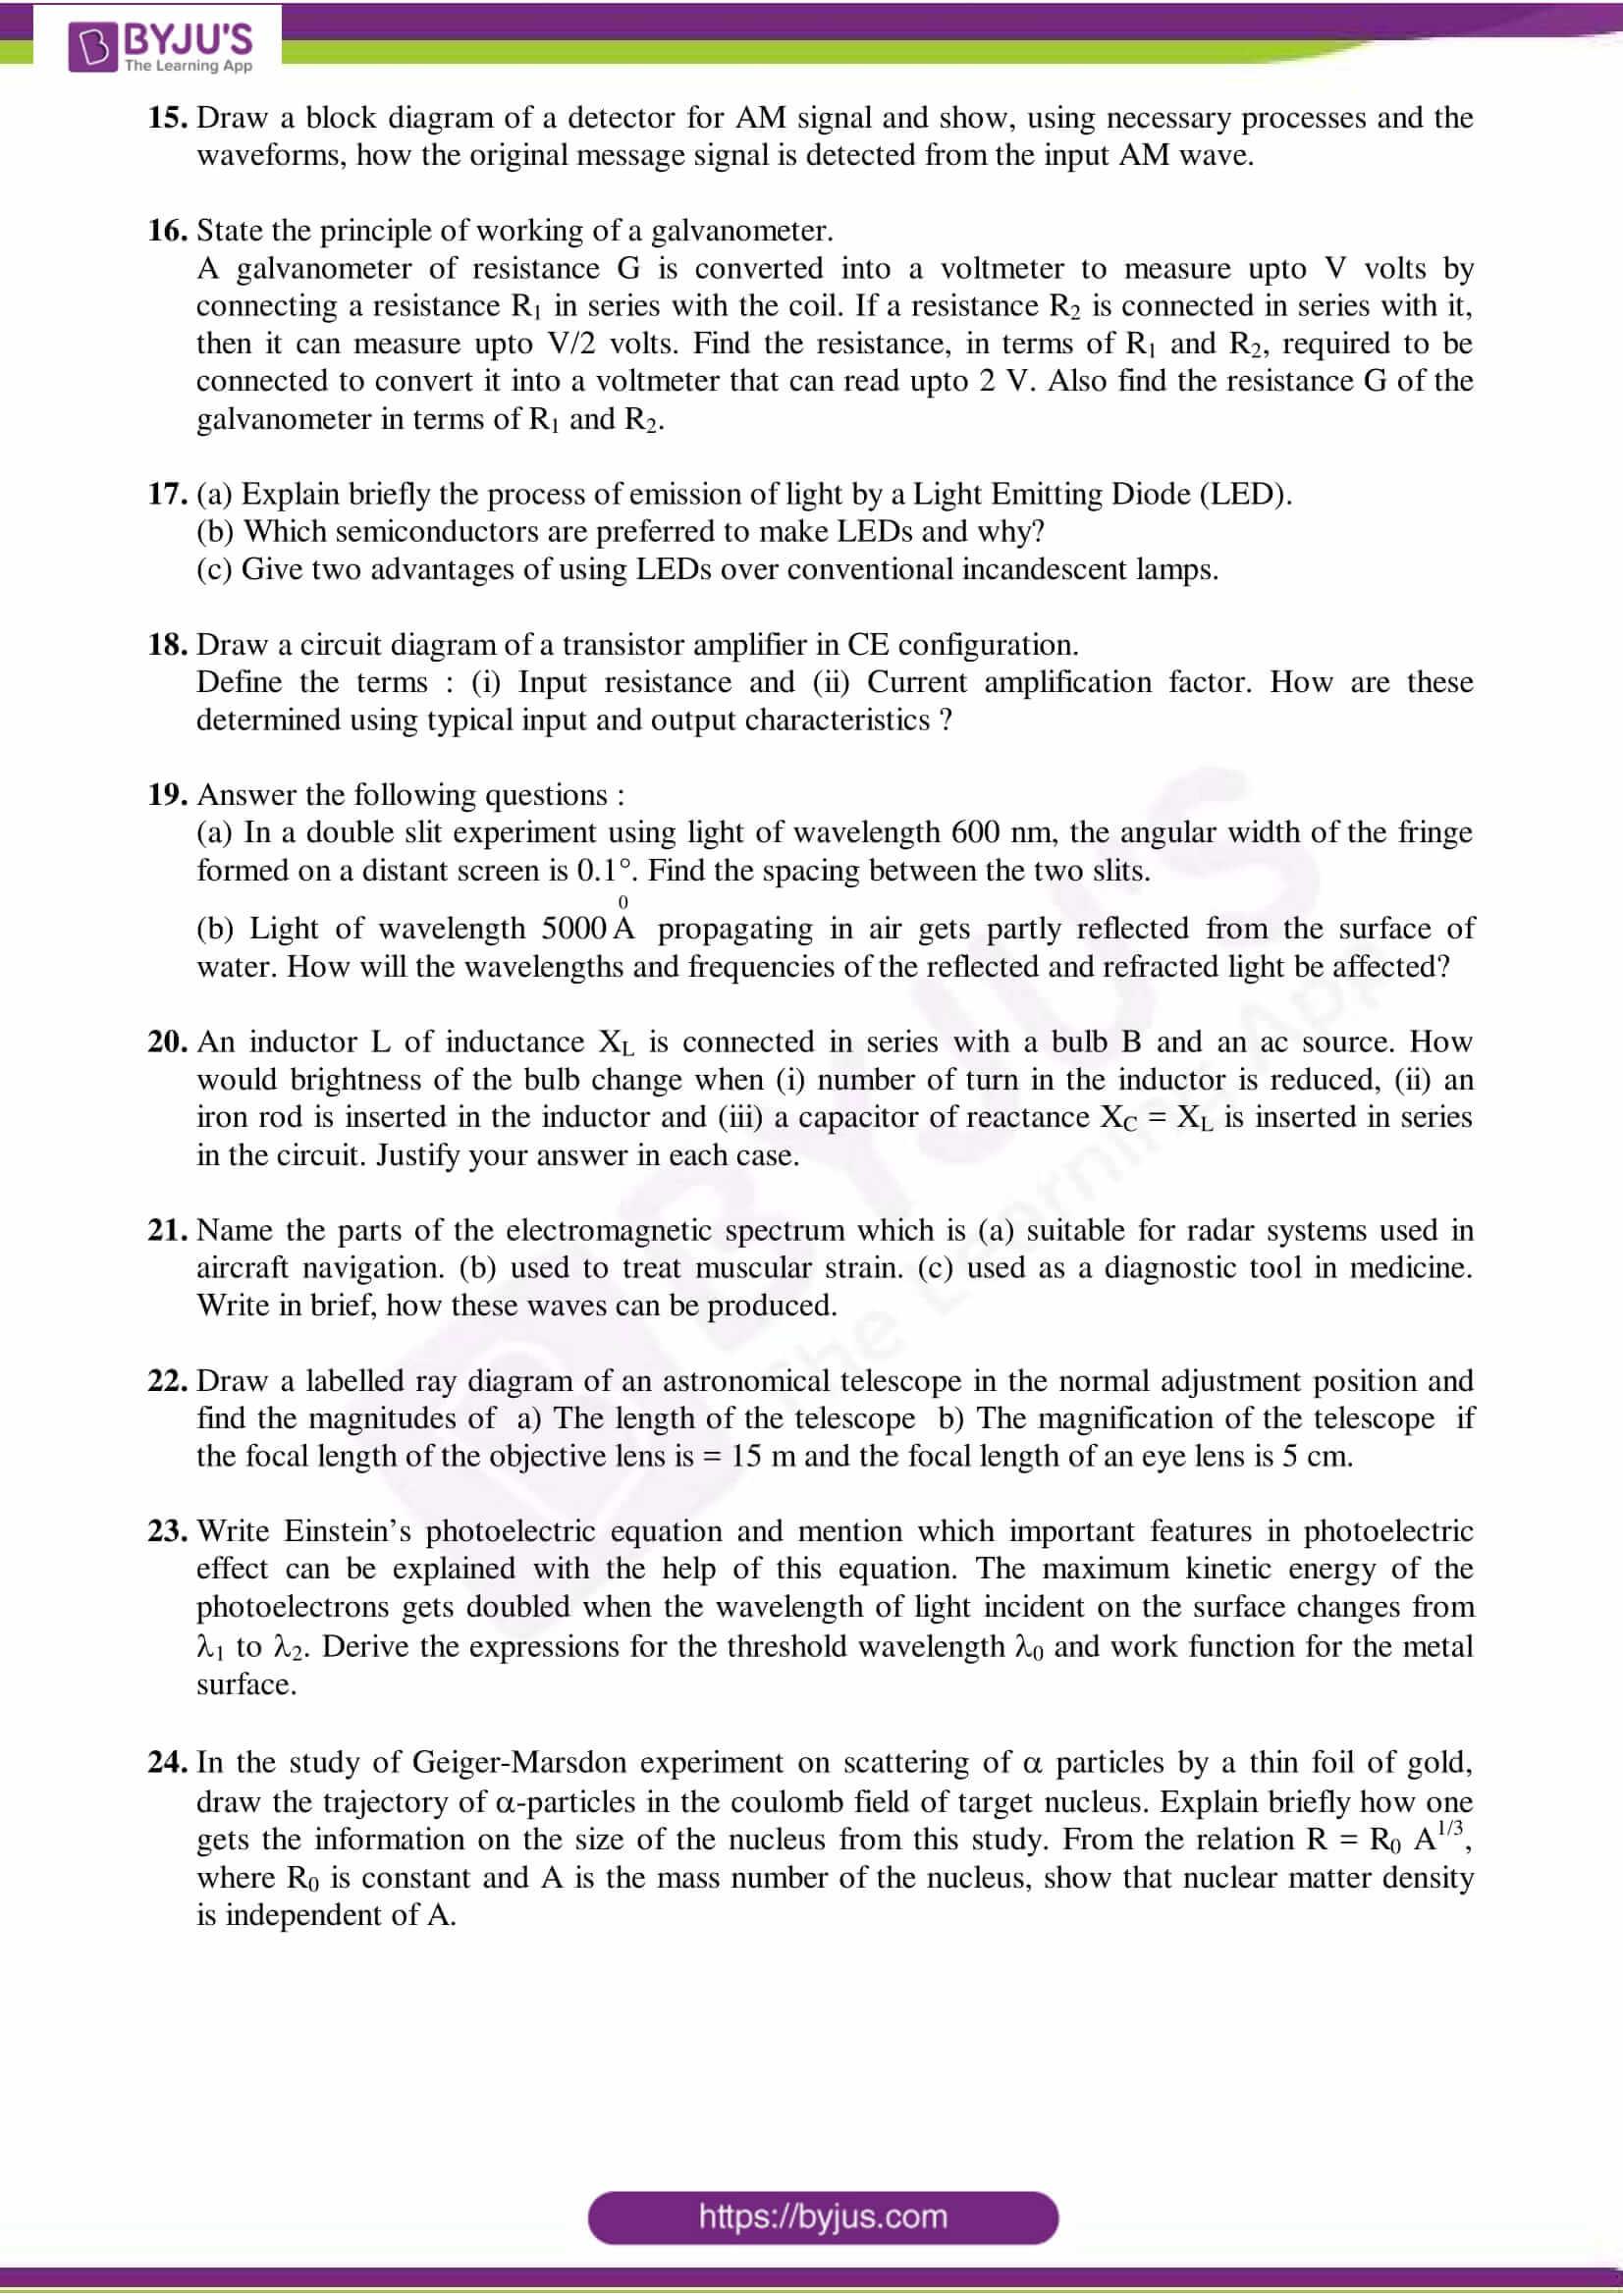 cbse class 12 physics sample paper set 4